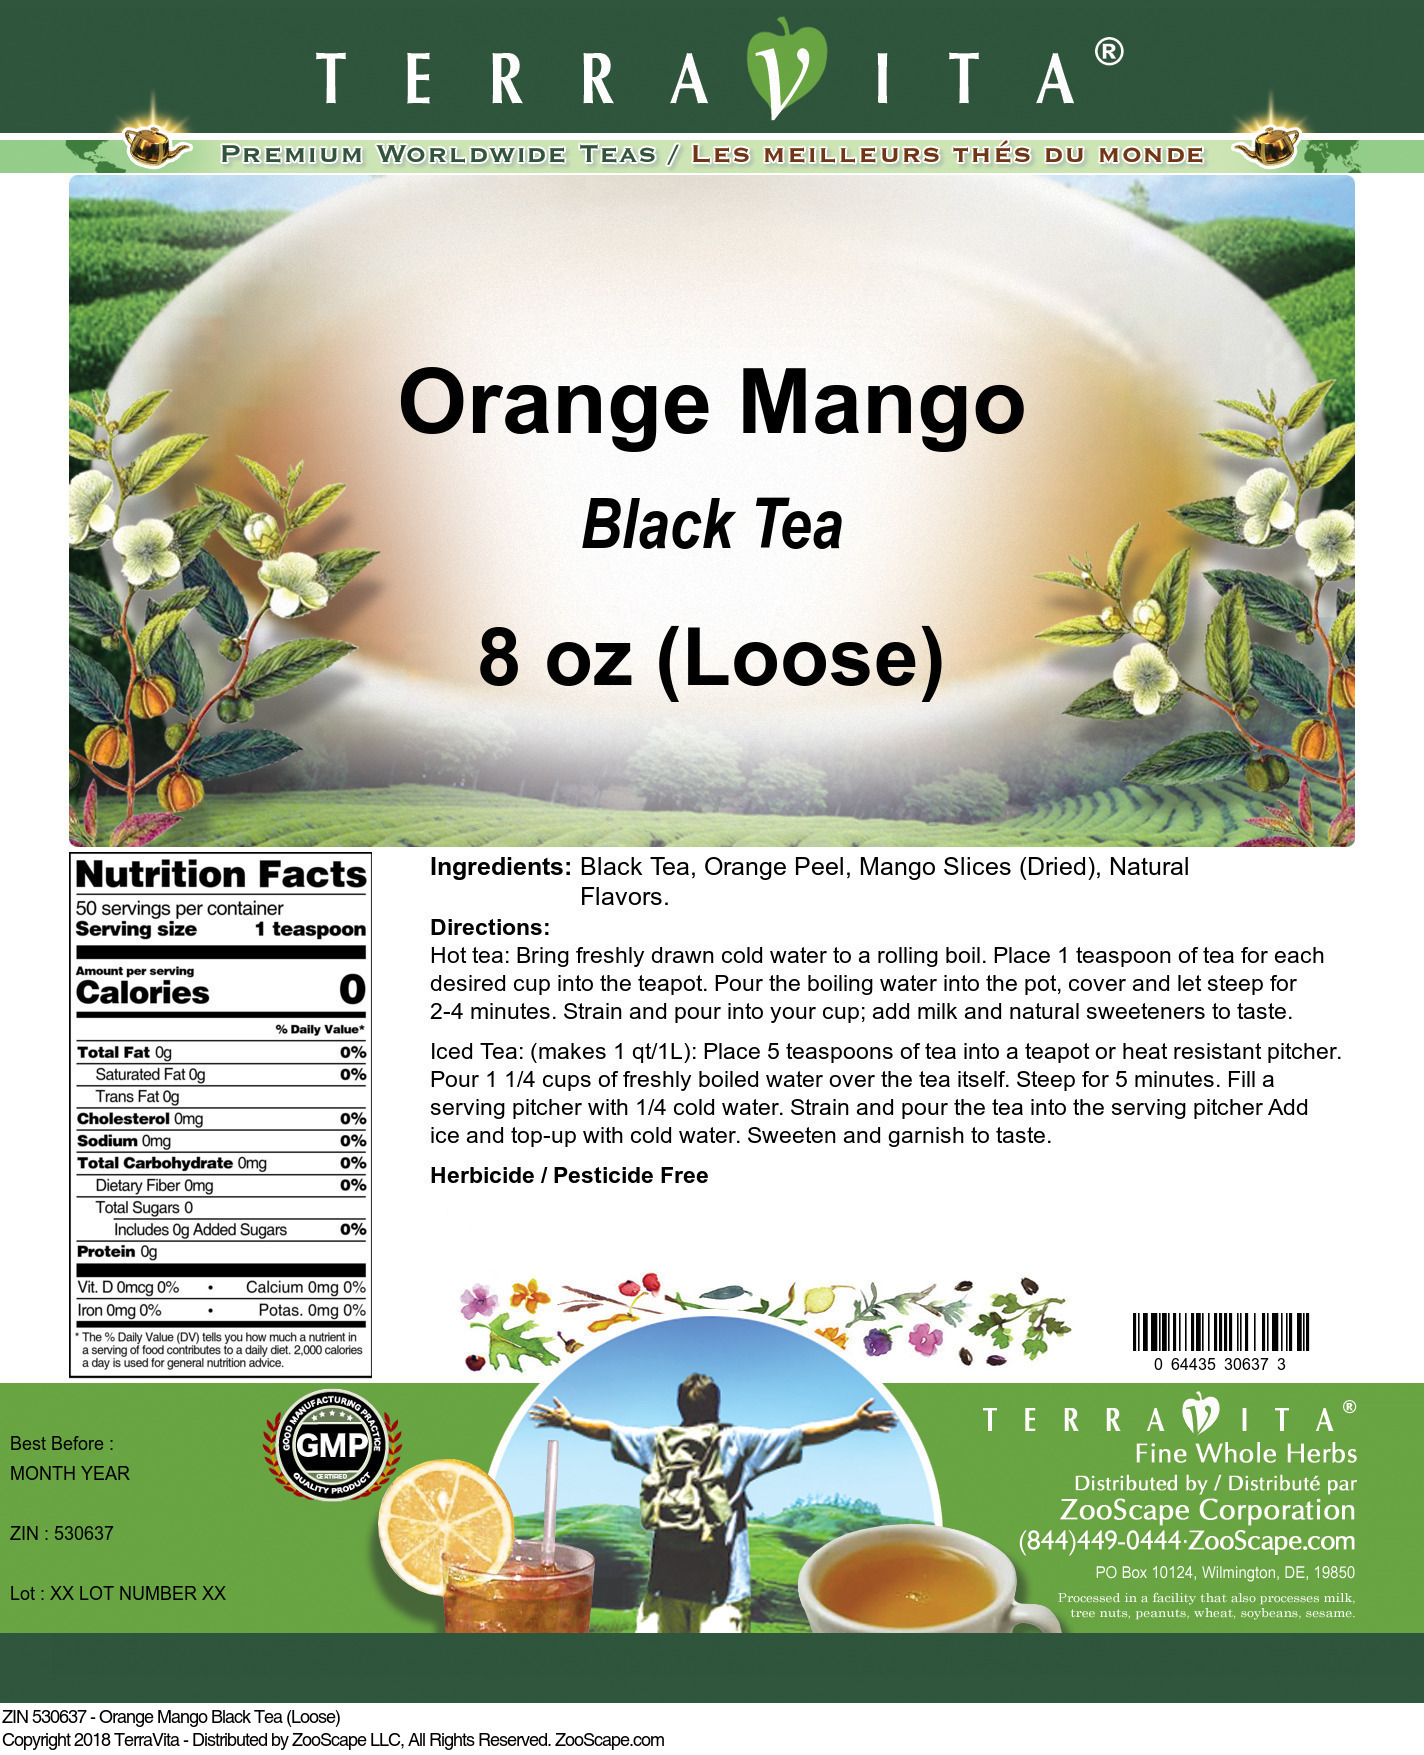 Orange Mango Black Tea (Loose)